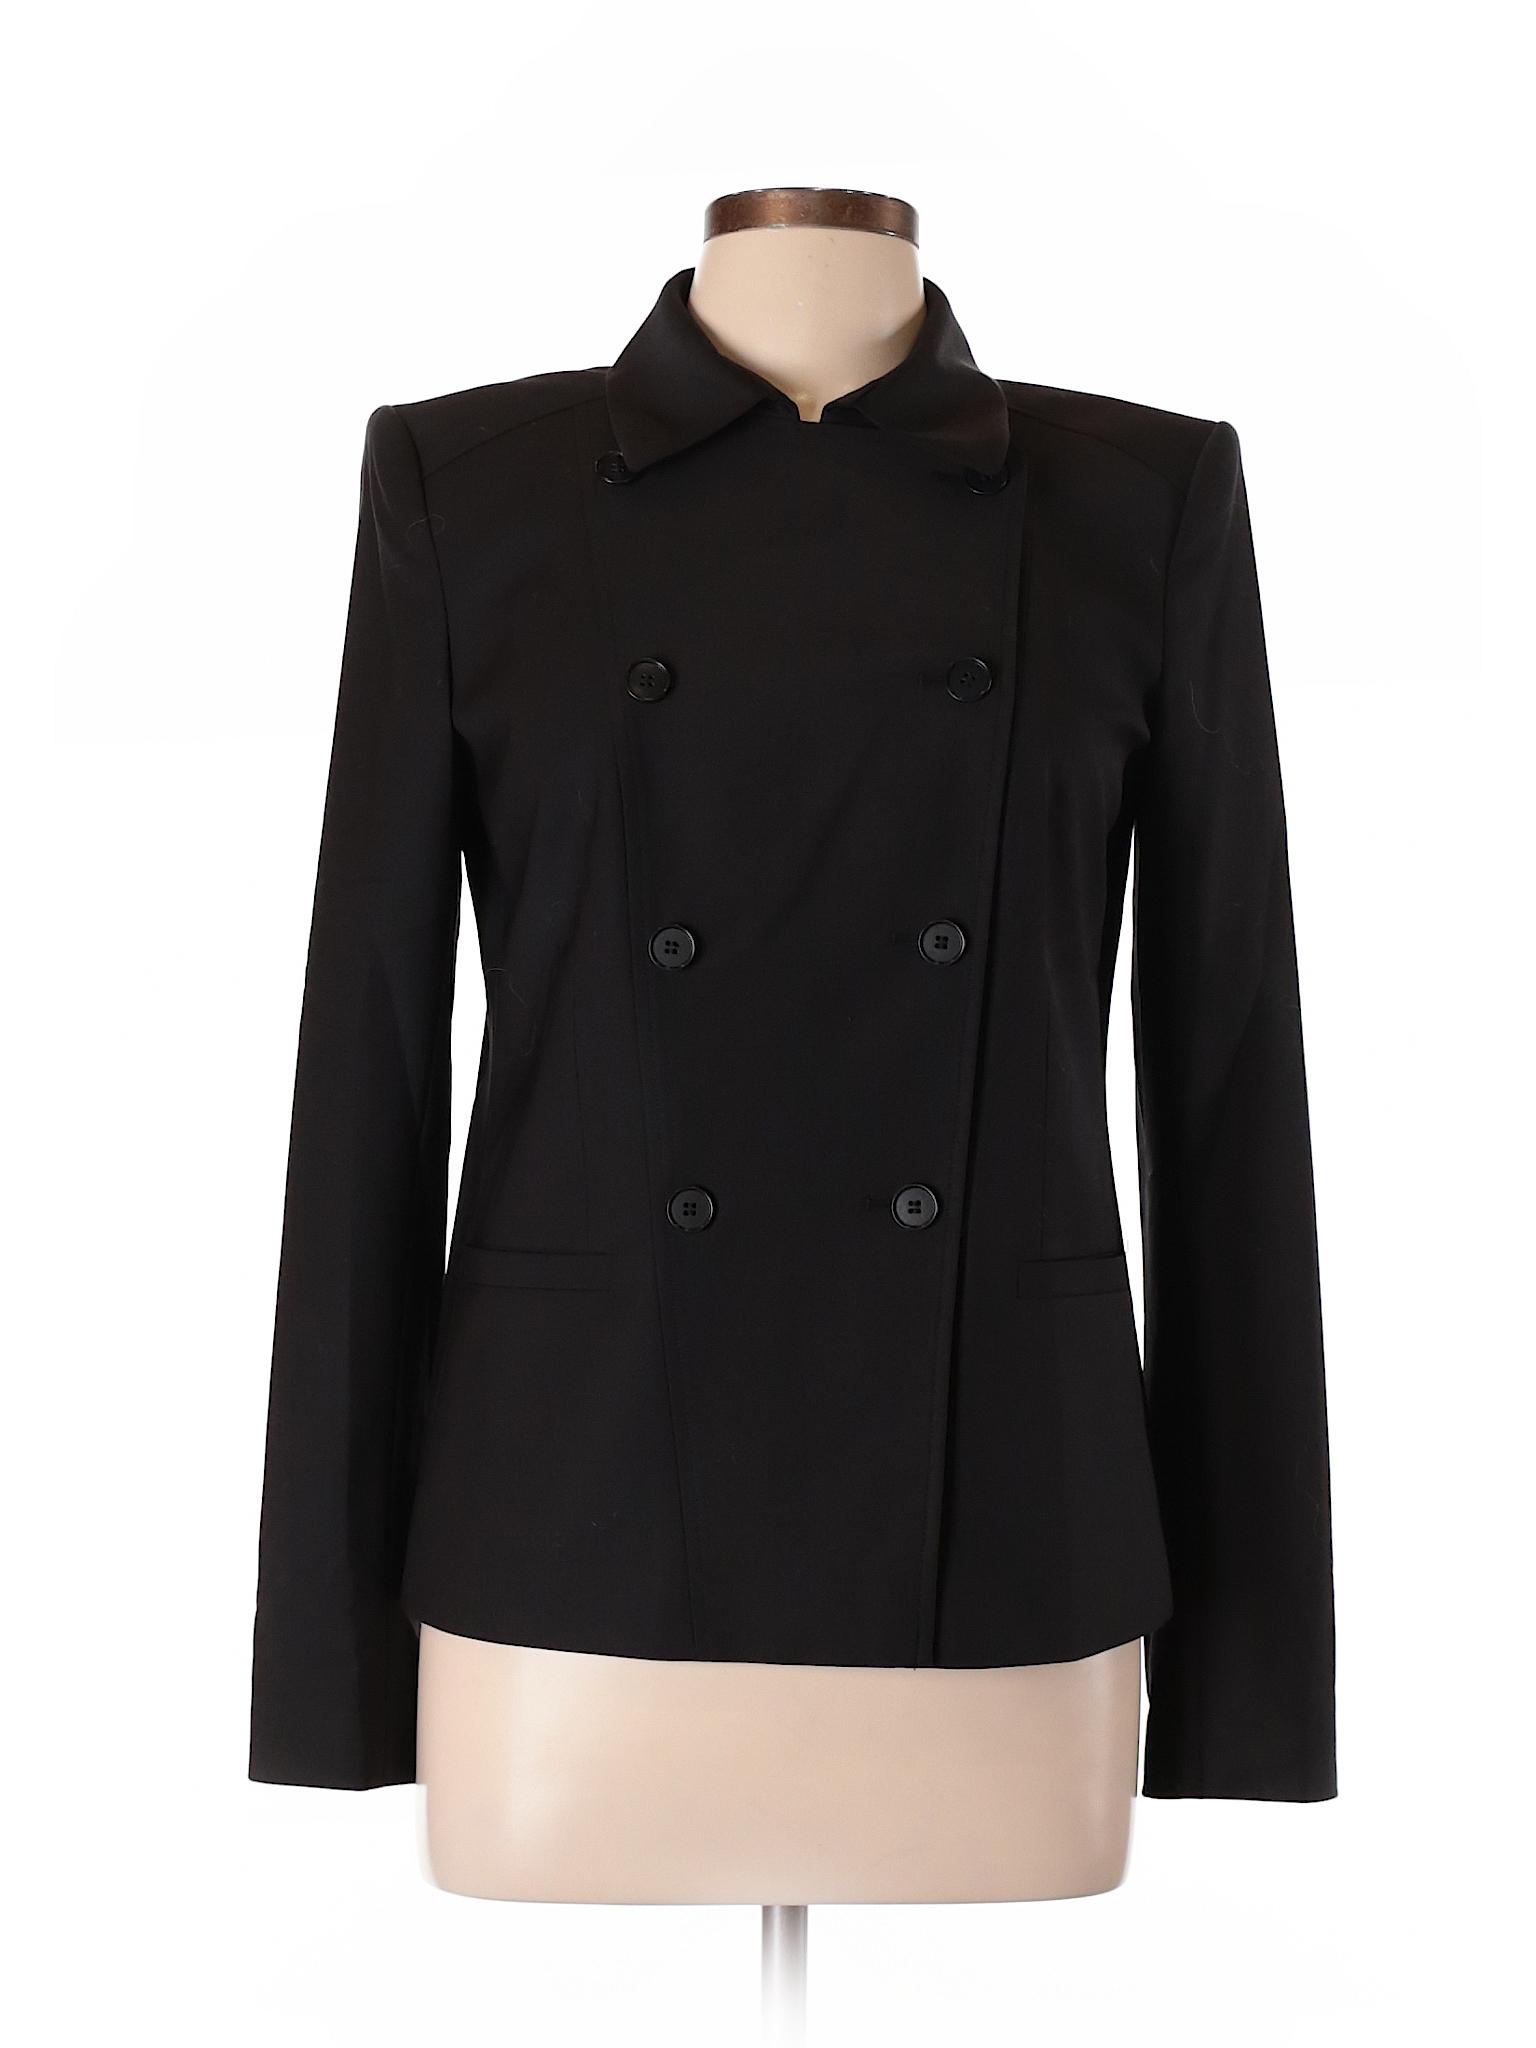 Taylor leisure Blazer Ann Boutique Wool wB8SwE